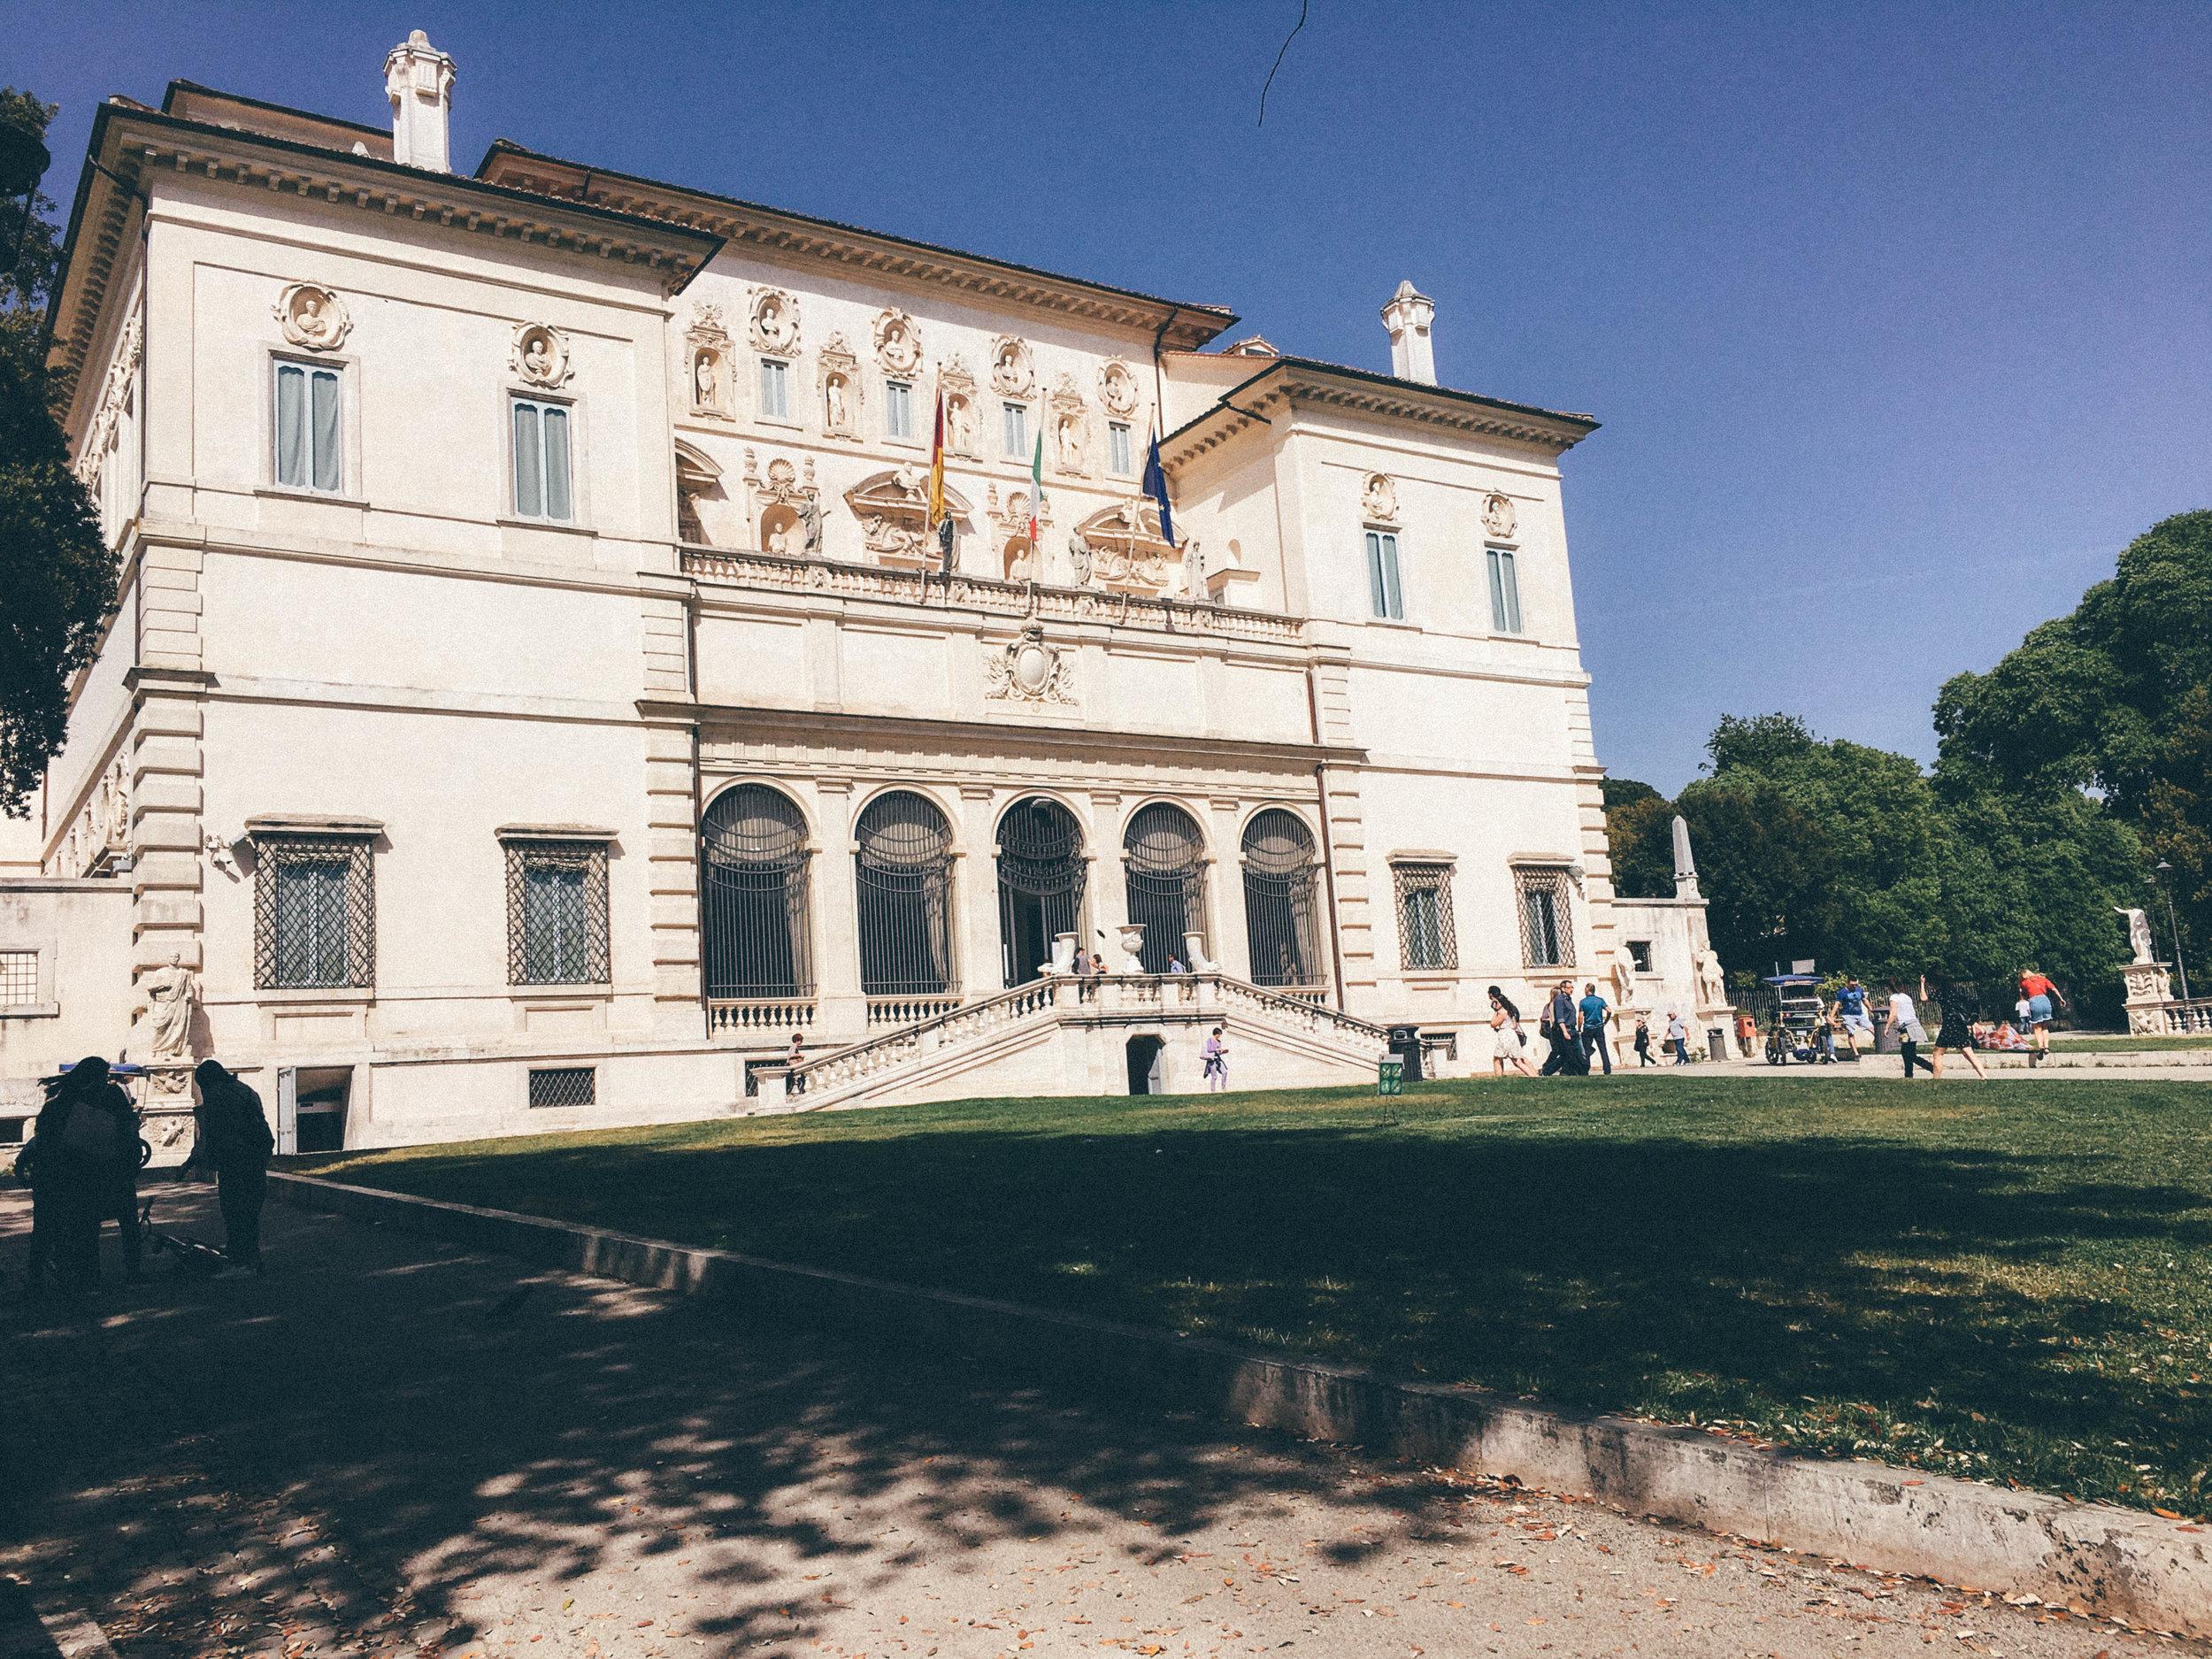 Borghese Gardens Museum